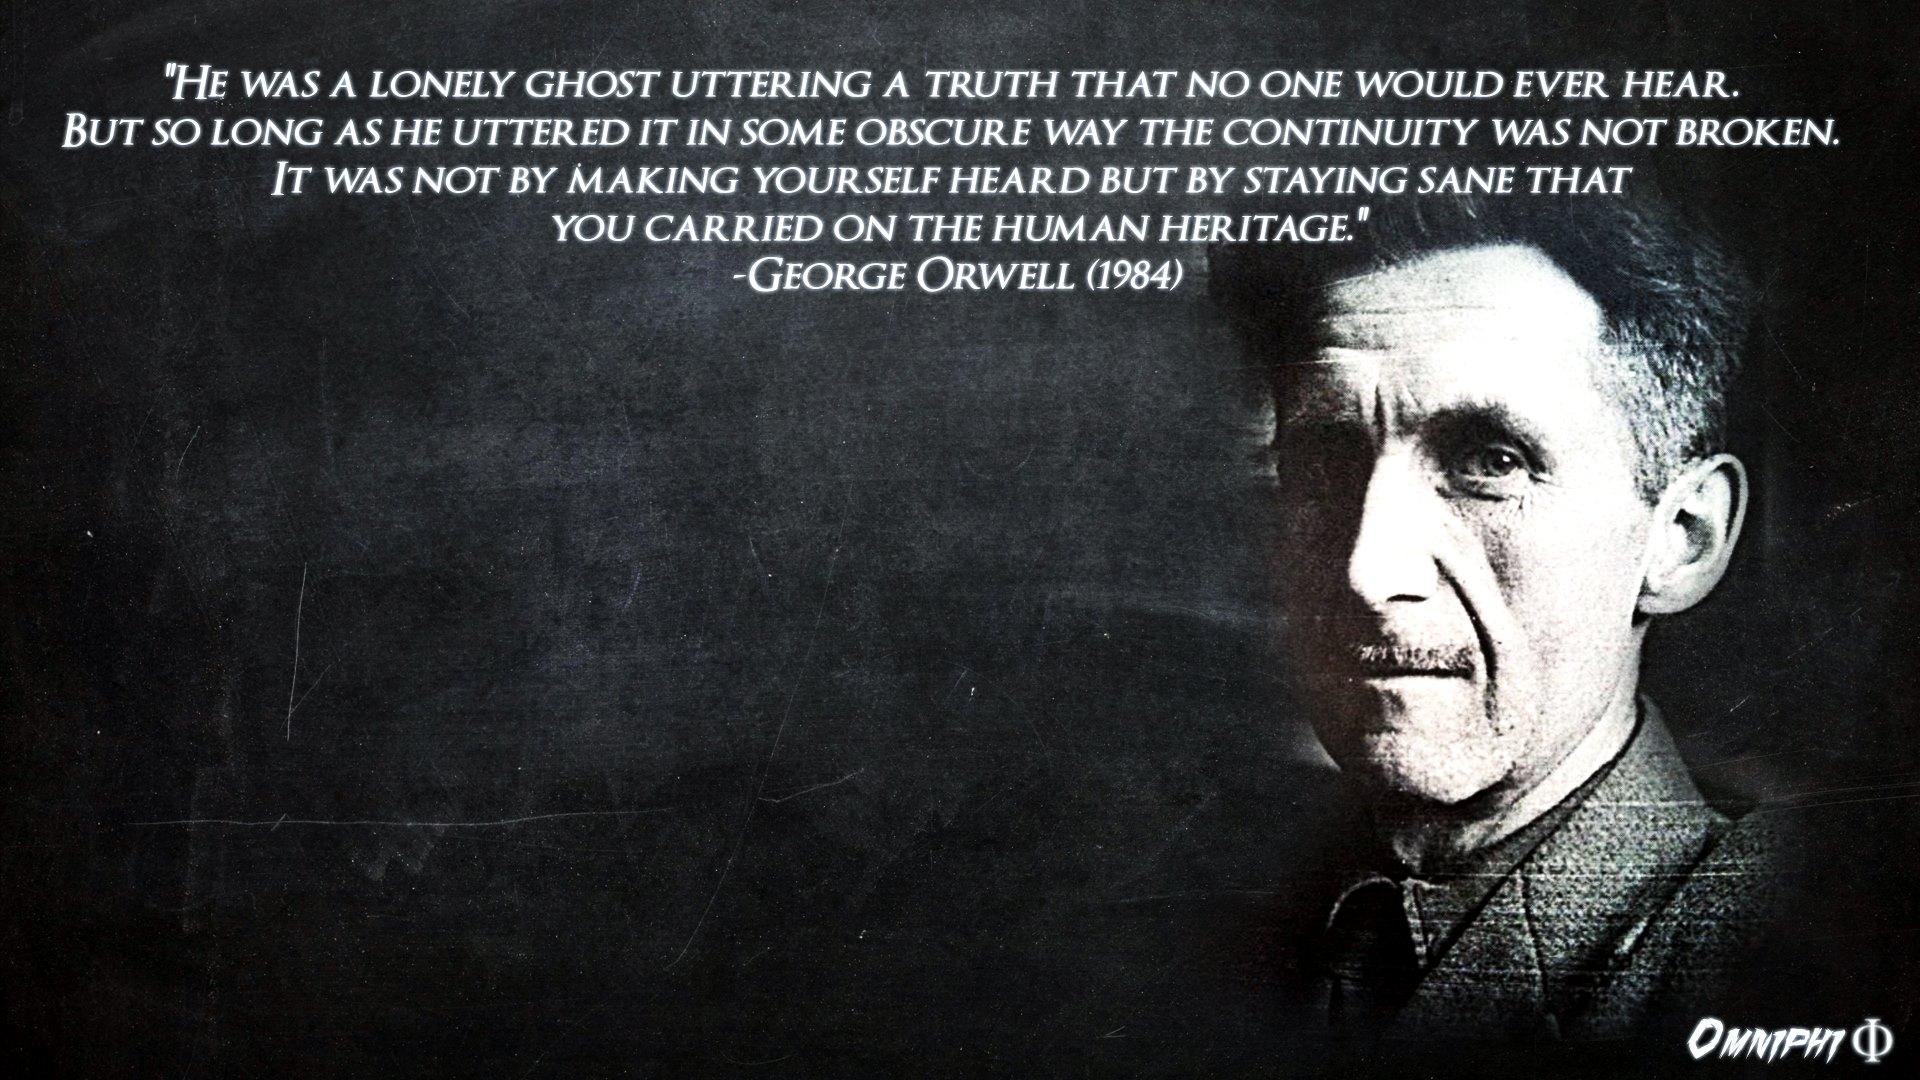 http://www.the-savoisien.com/blog/public/img27/Orwell.jpg